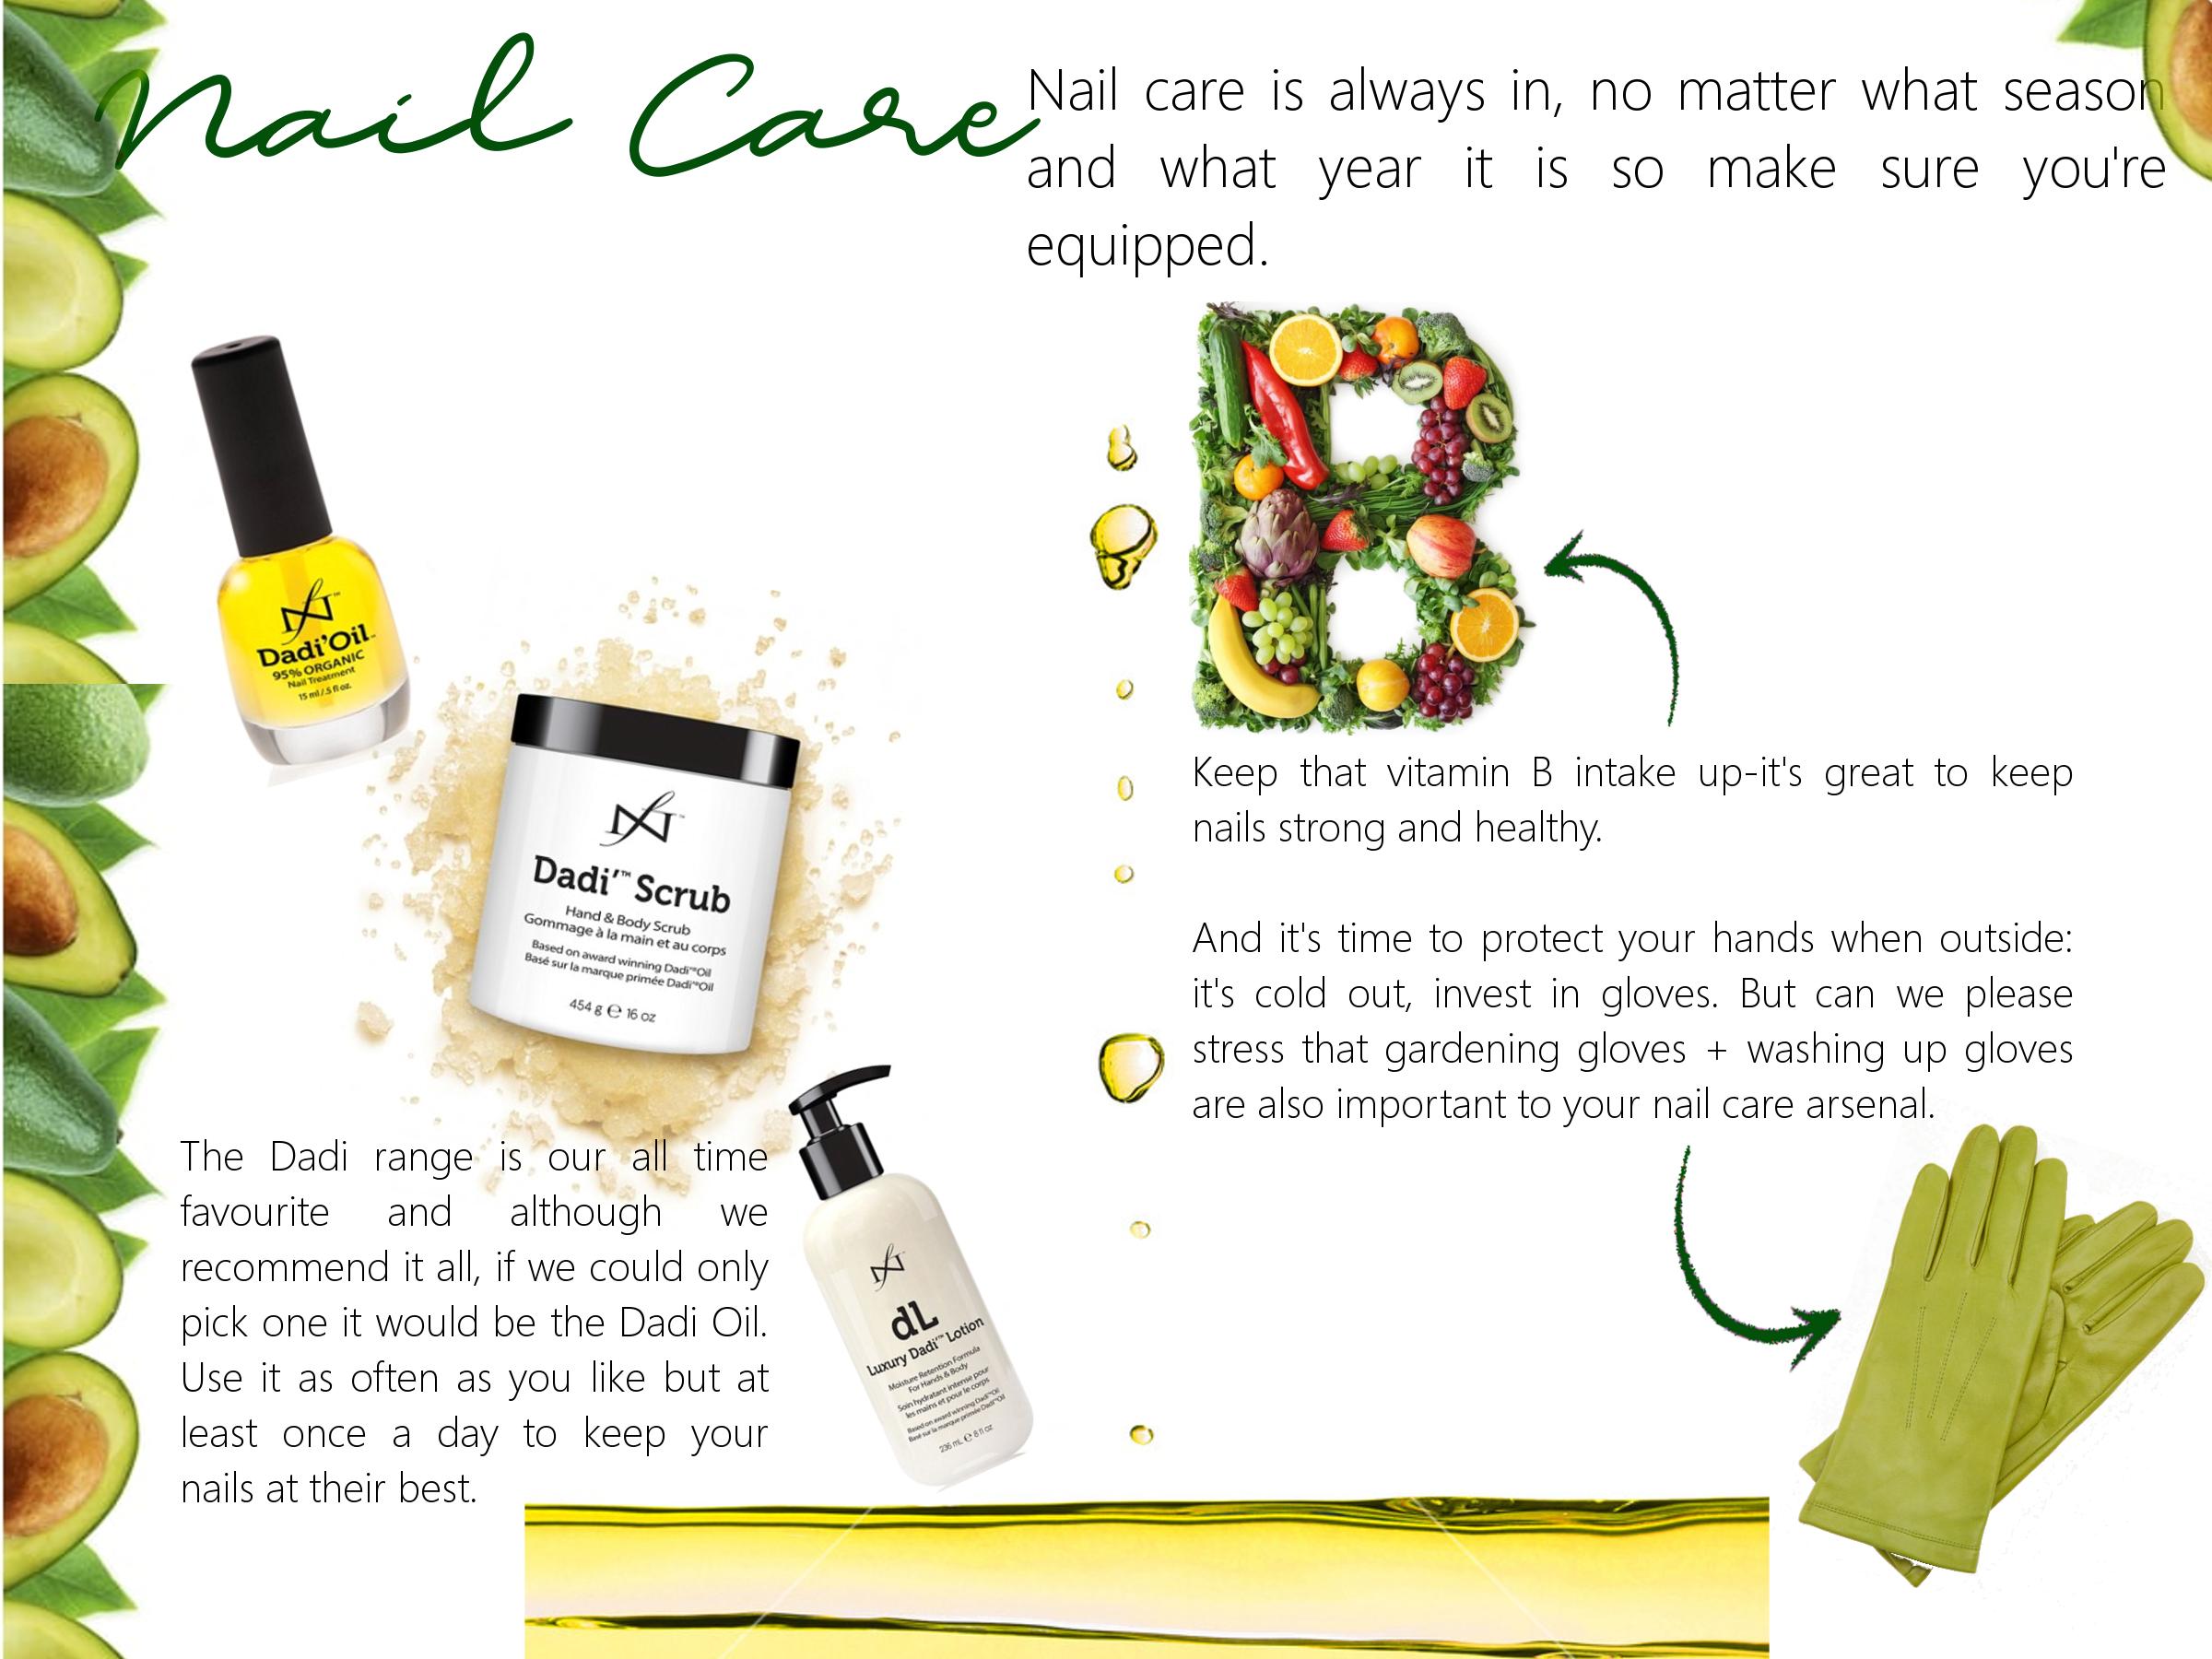 Venus-Beauty-Hair-Salon-Tavistock-Devon-Winter-Trends-Nails-Gelish-Manicure-Nail-Care-Dadi-Oil.png